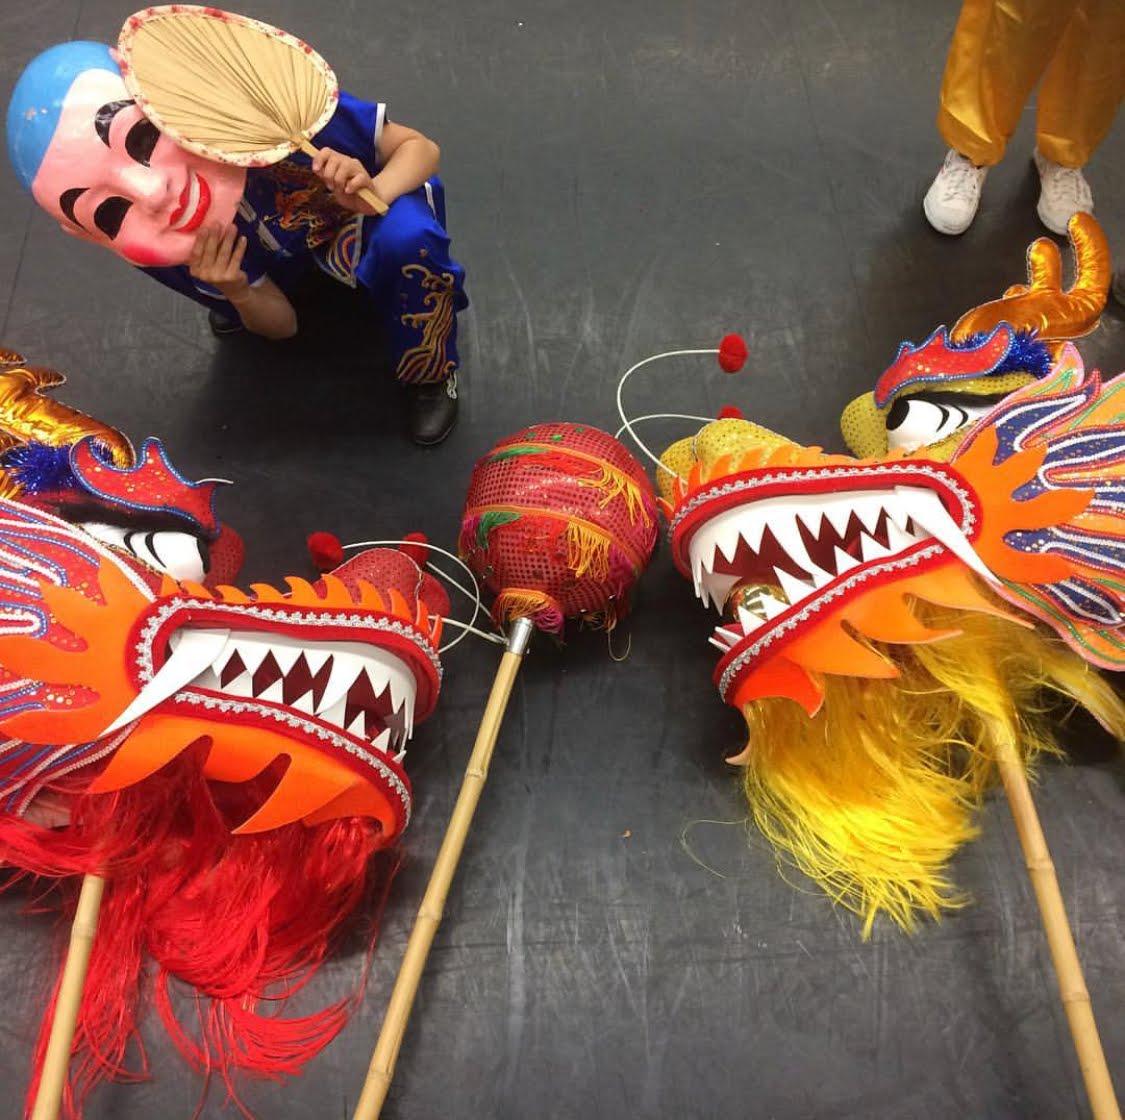 wayland-li-wushu-sony-centre-spring-festival-2018-gala-toronto-canada-10.jpg